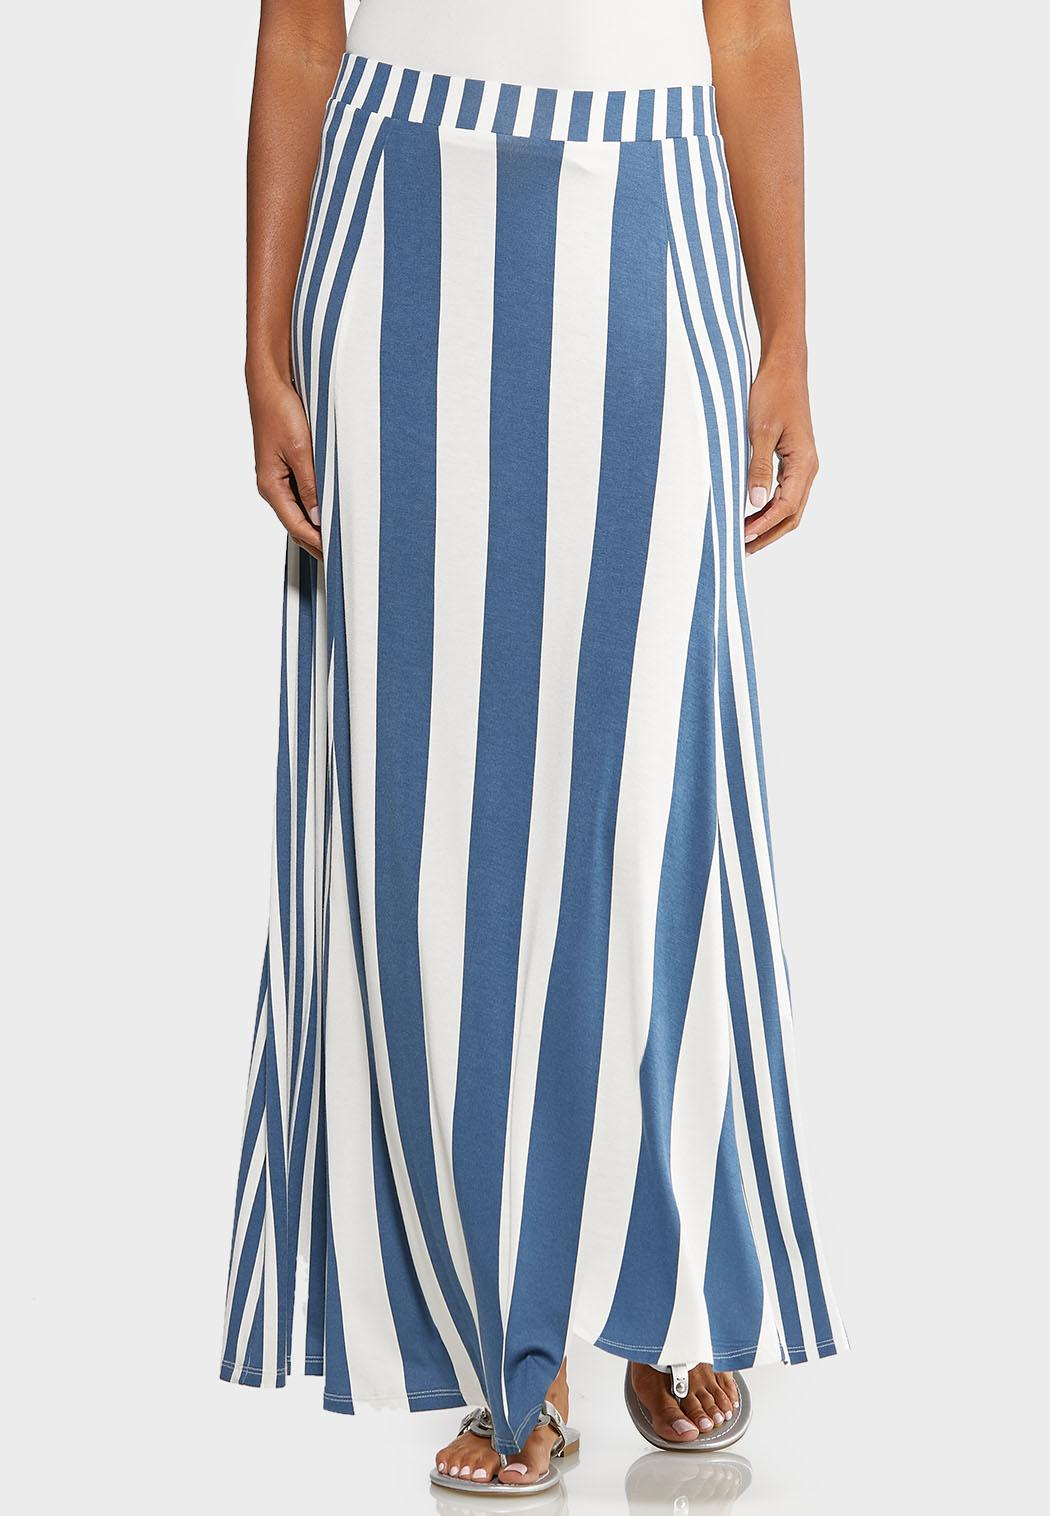 4cdba85c0b7 Sailor Stripe Maxi Skirt alternate view · Sailor Stripe Maxi Skirt